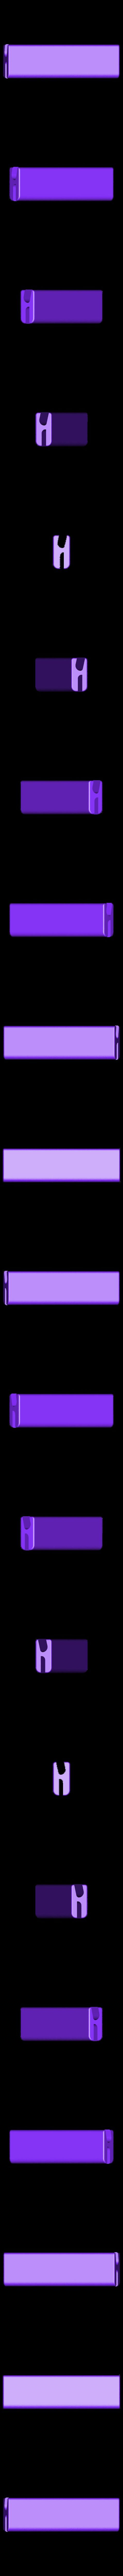 Support IPAD AIR3 and Iphone 7 on Macbook Retina touchbar.stl Download free STL file Ipad Air 3 and Iphone 7 support on Macbook Retina touchbar • 3D print object, plopjlf